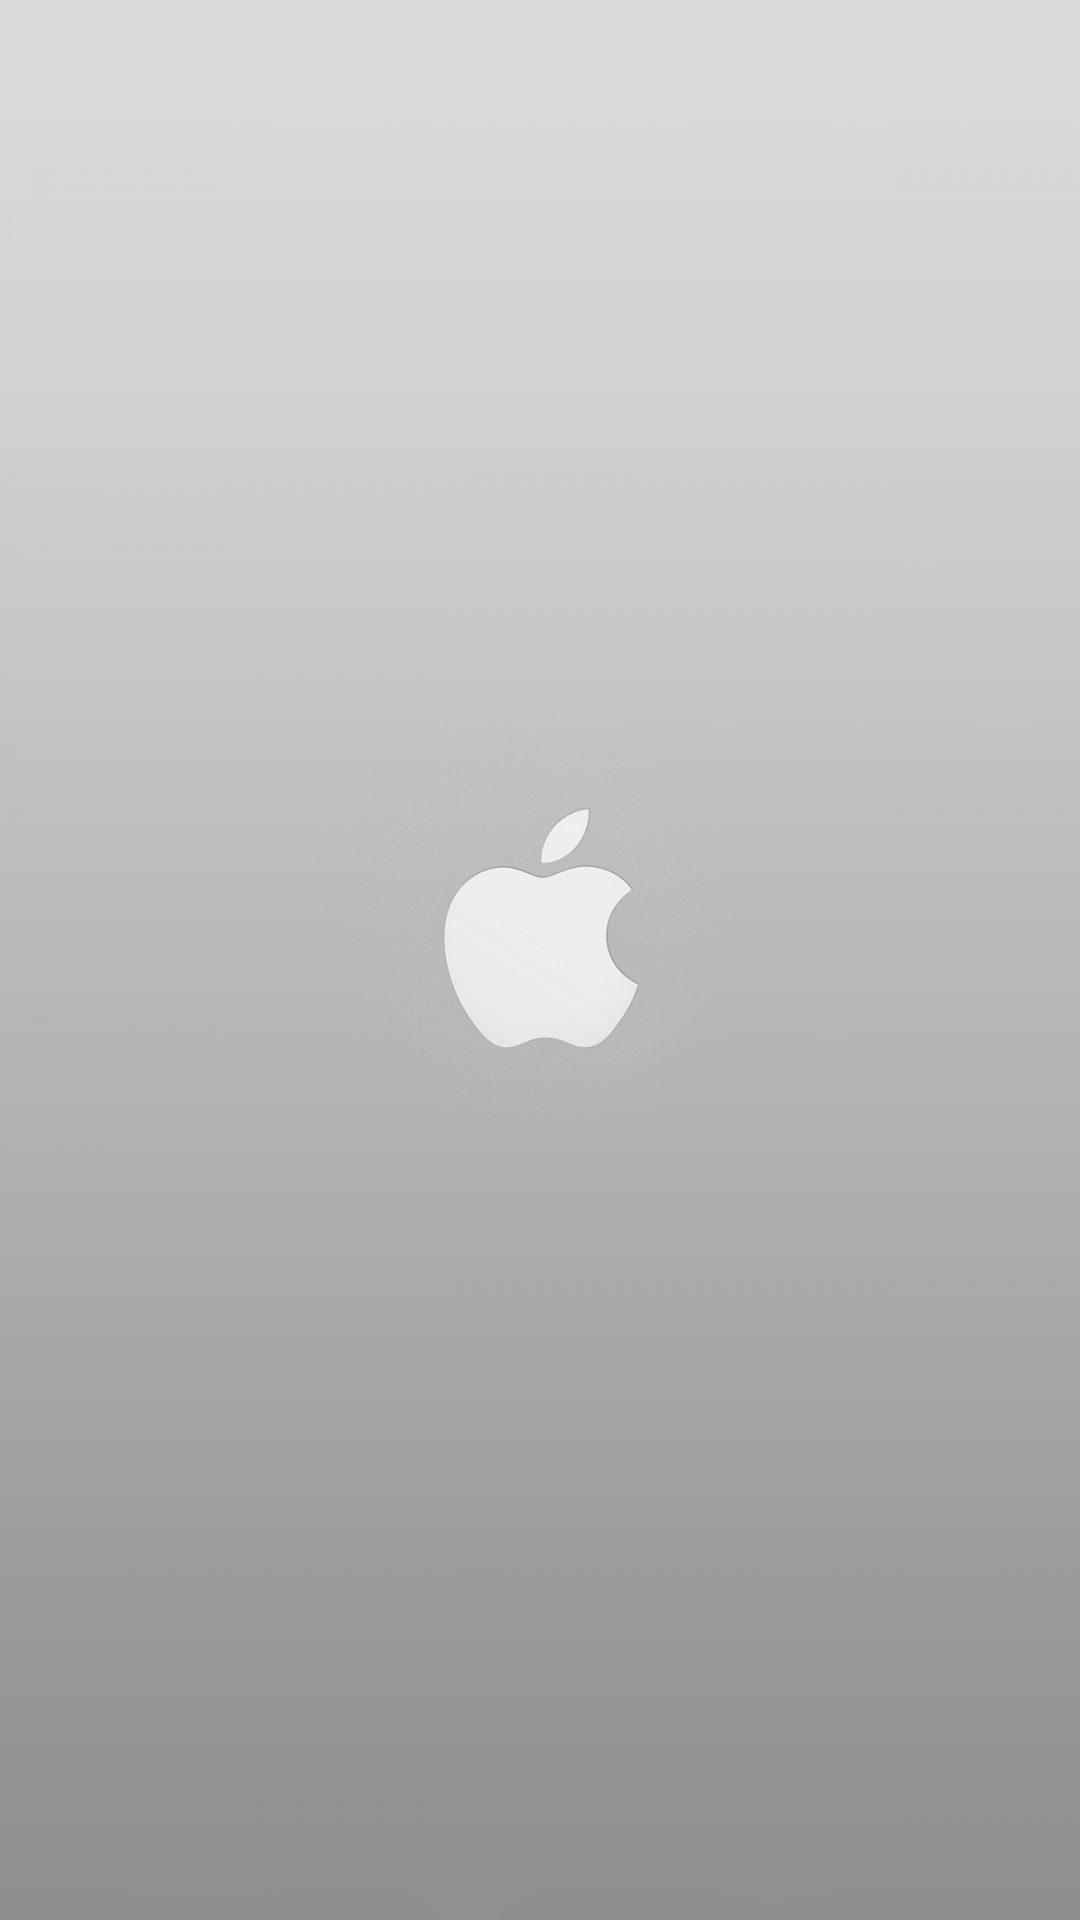 Logo Apple White Minimal Illustration Art Color Gray